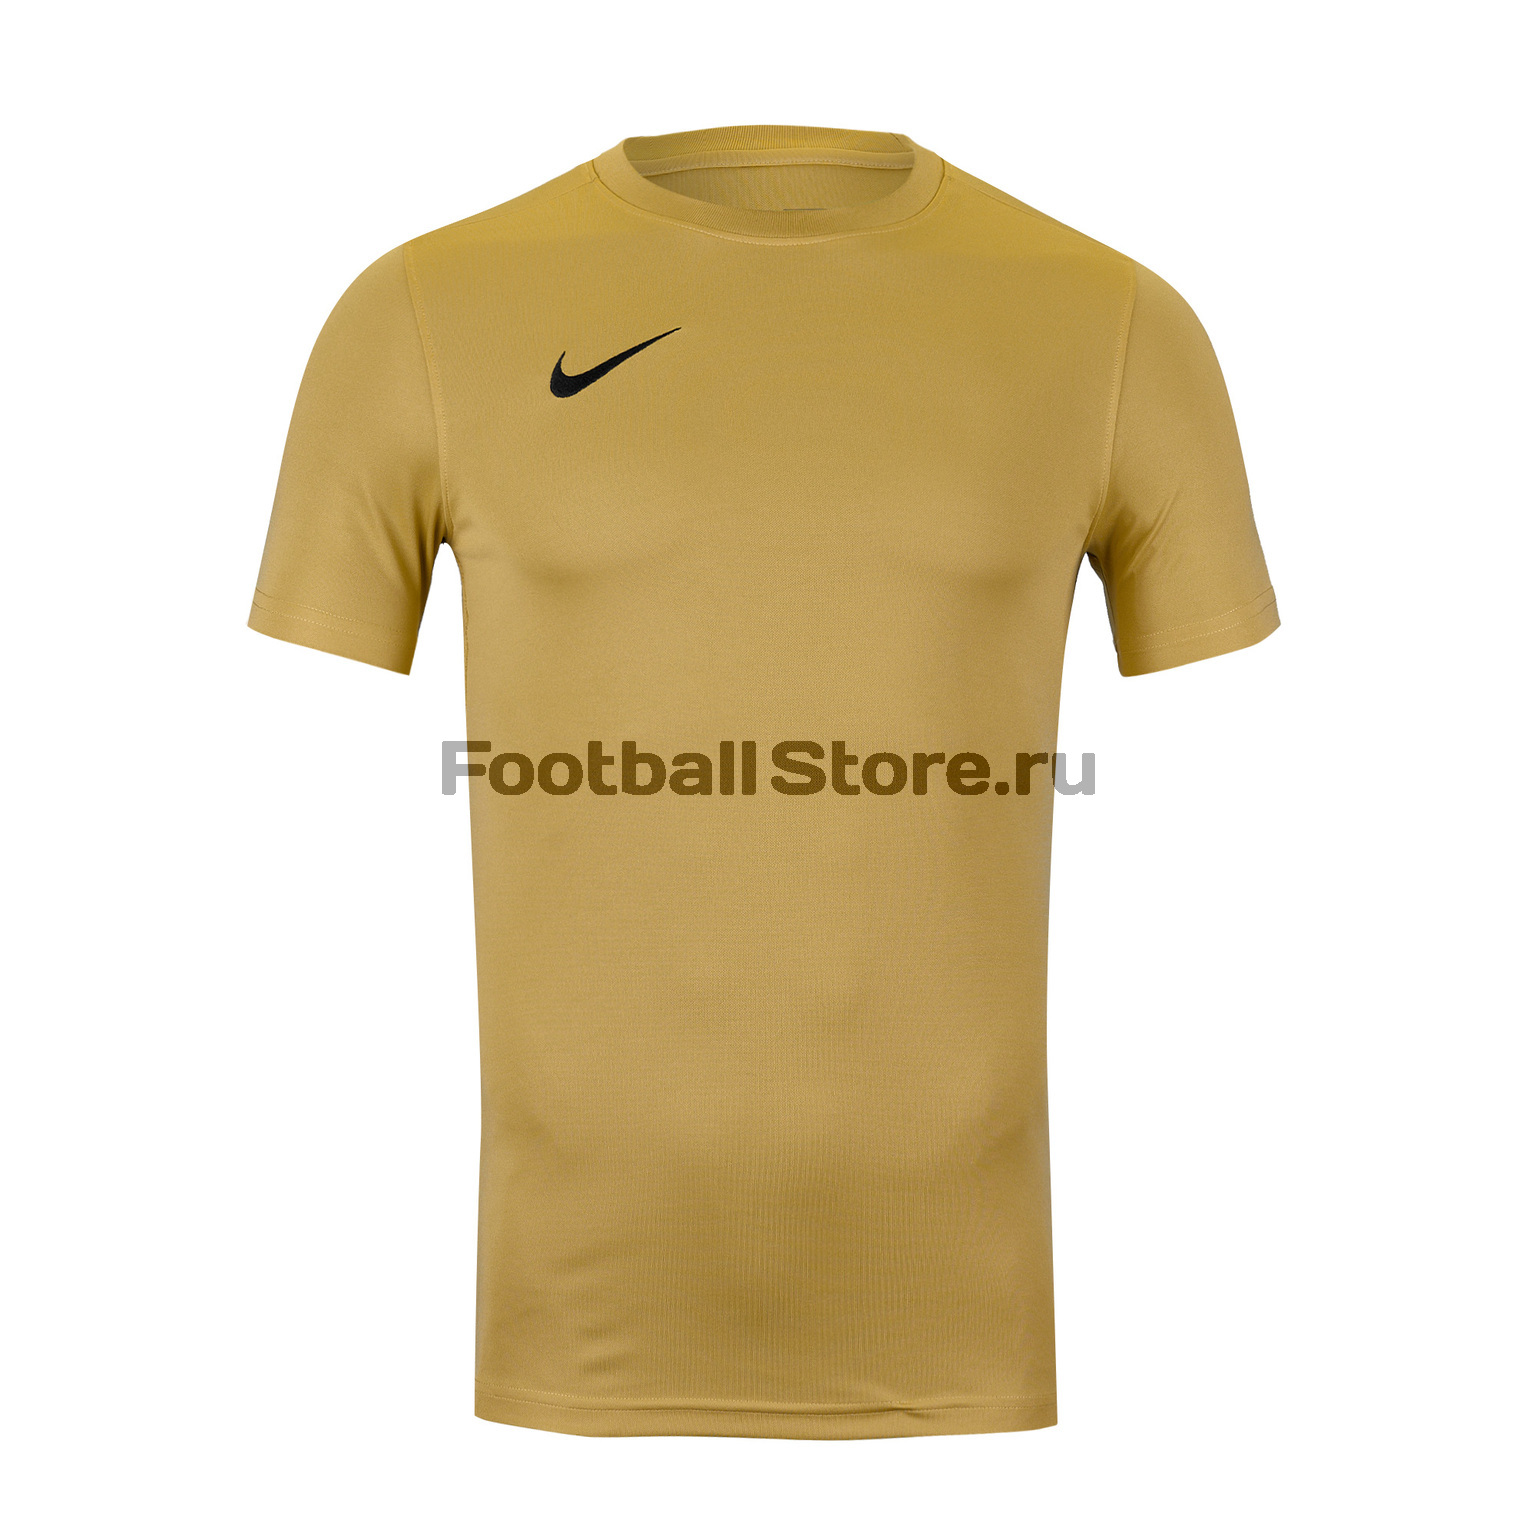 Футболка игровая Nike Dry Park VII BV6708-729 цена и фото